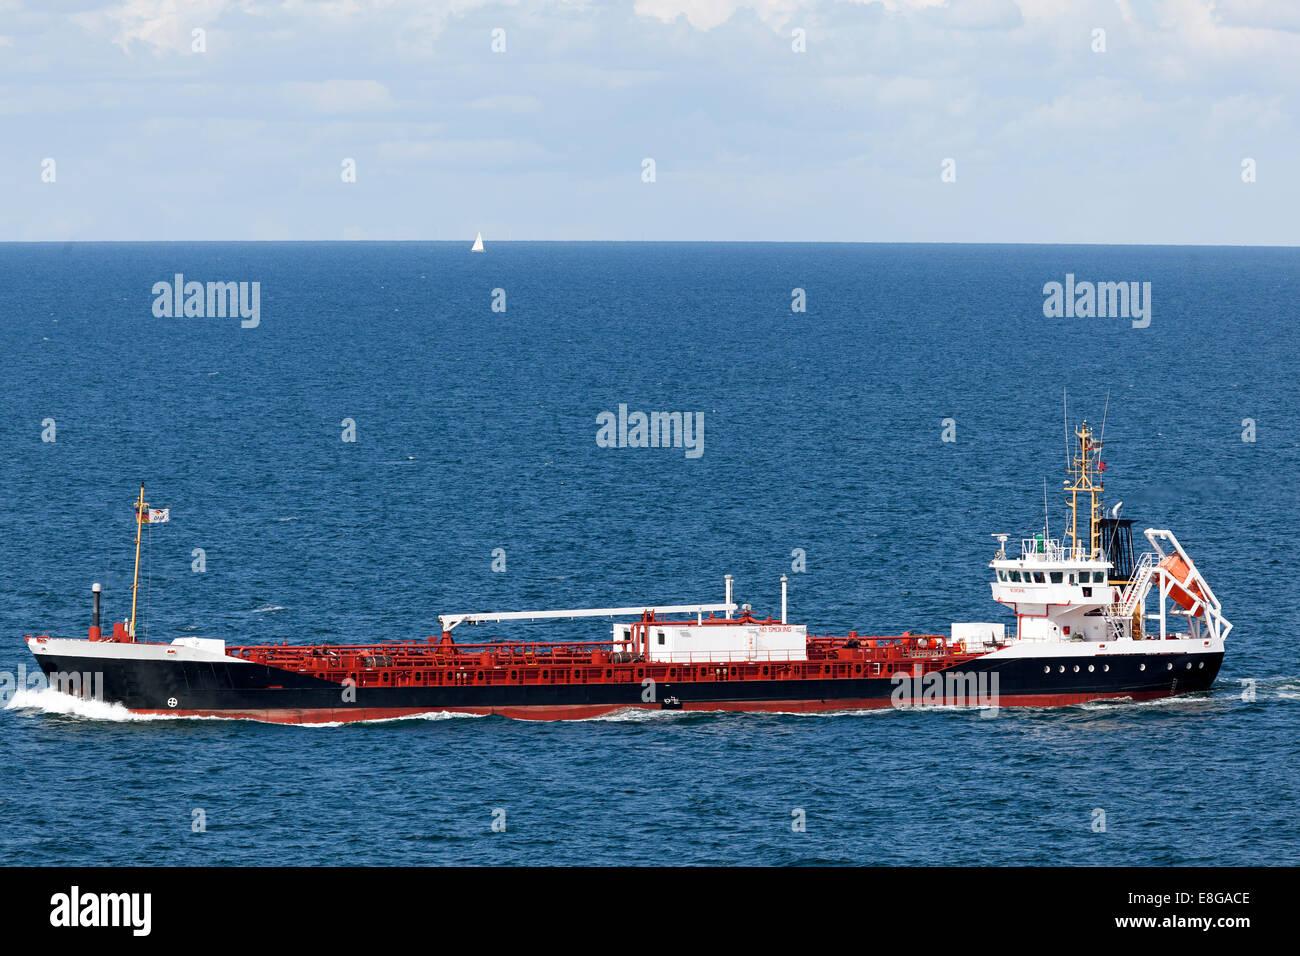 Freight vessel on the Baltic Sea near the Island of Langeland, Denmark Stock Photo